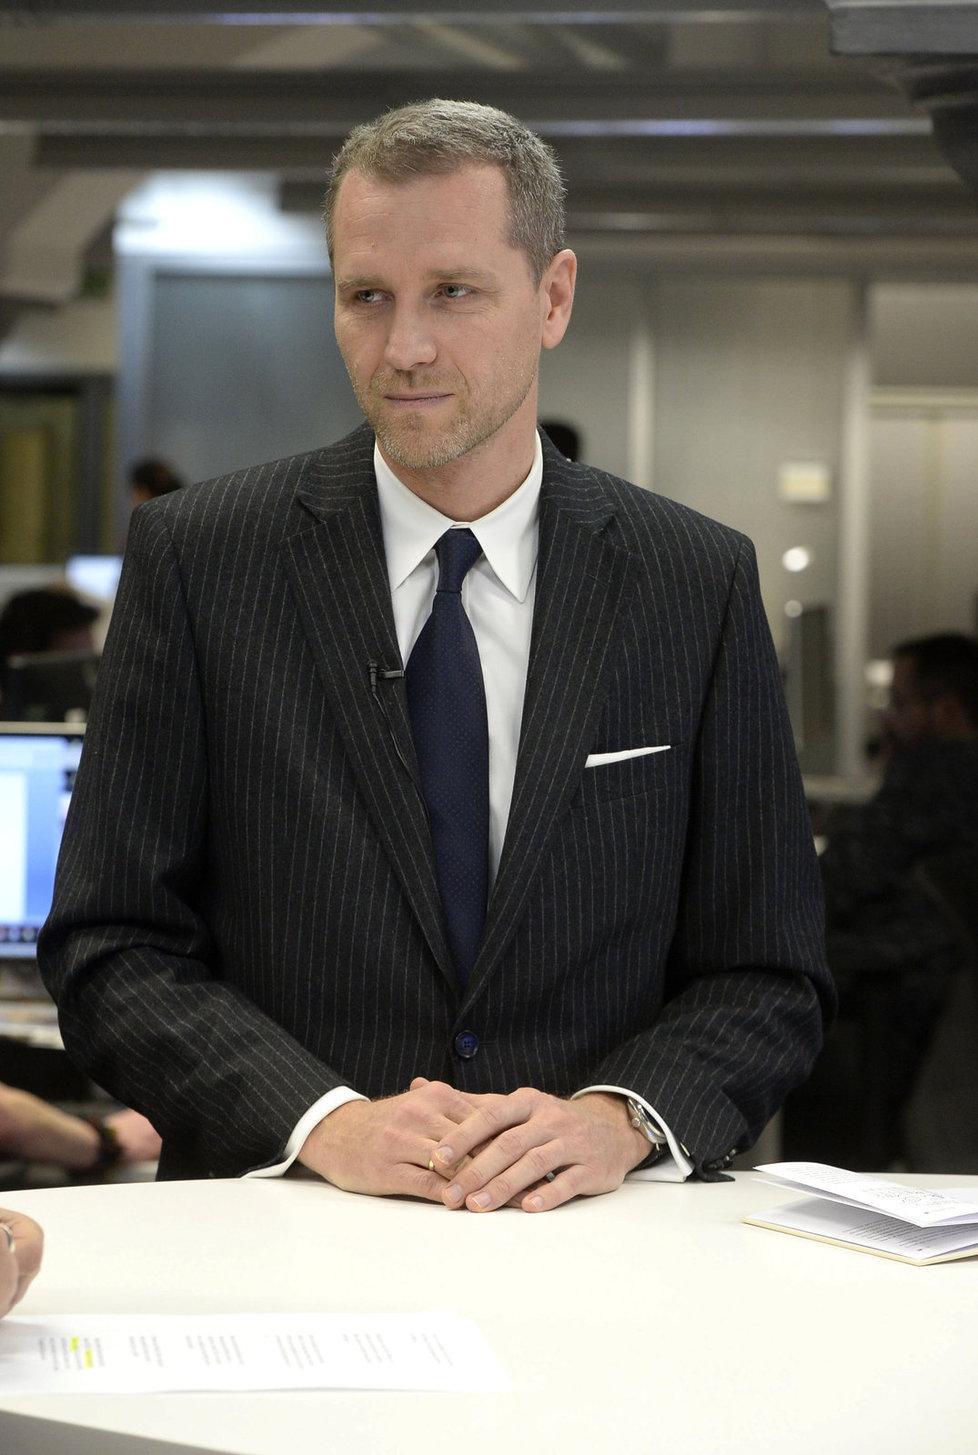 Šéf bavorské AfD Petr Bystroň ve studiu Blesk TV